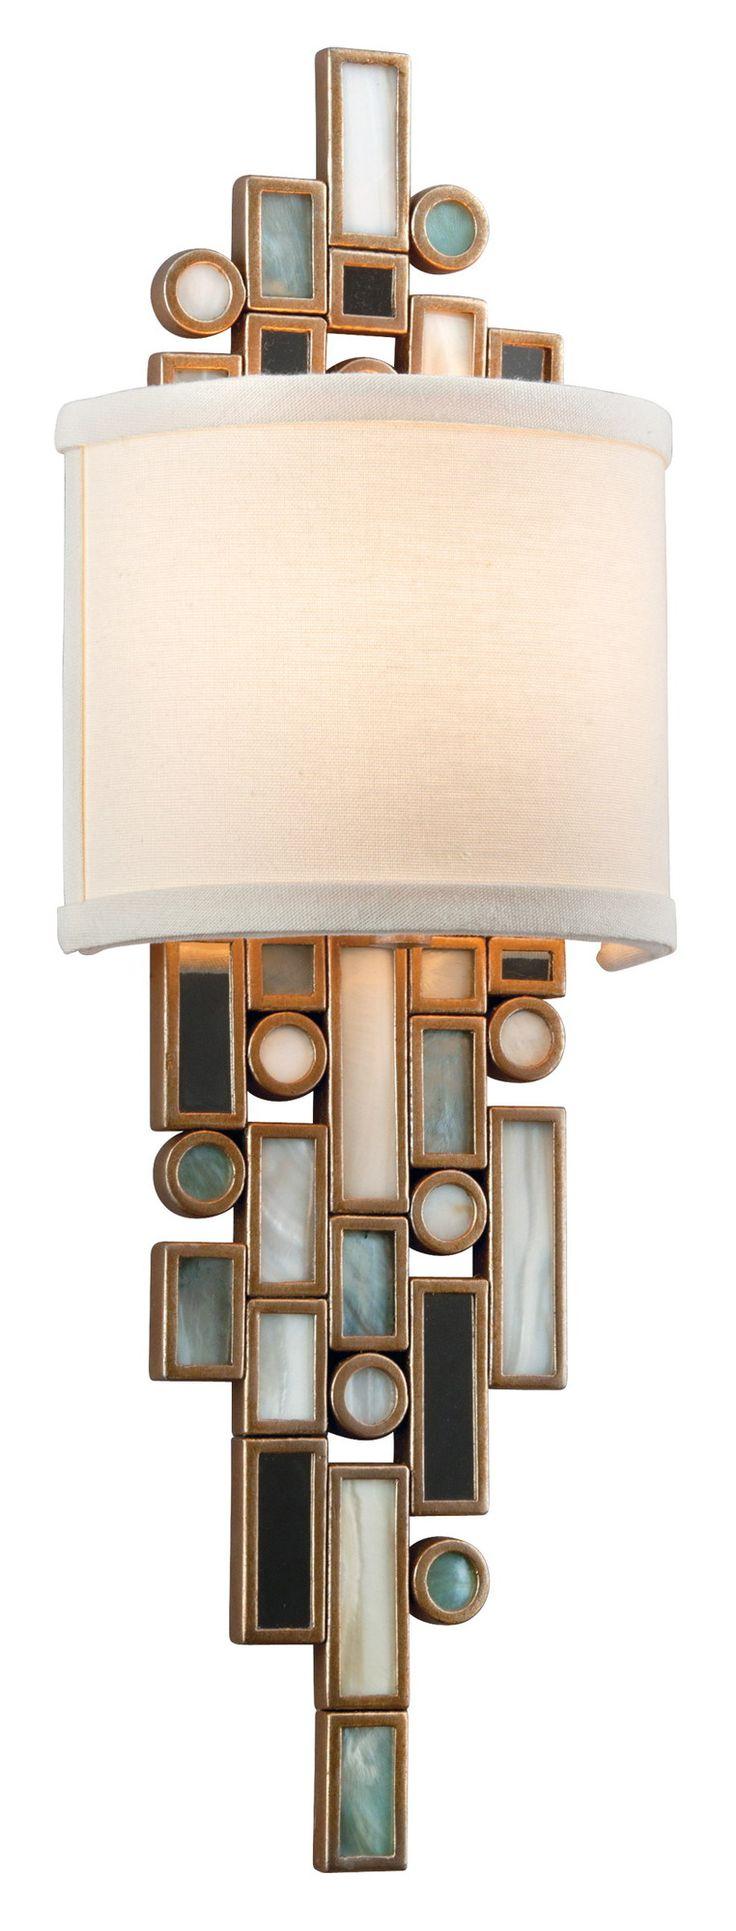 Corbett Lighting Dolcetti Wall Sconce in Silver